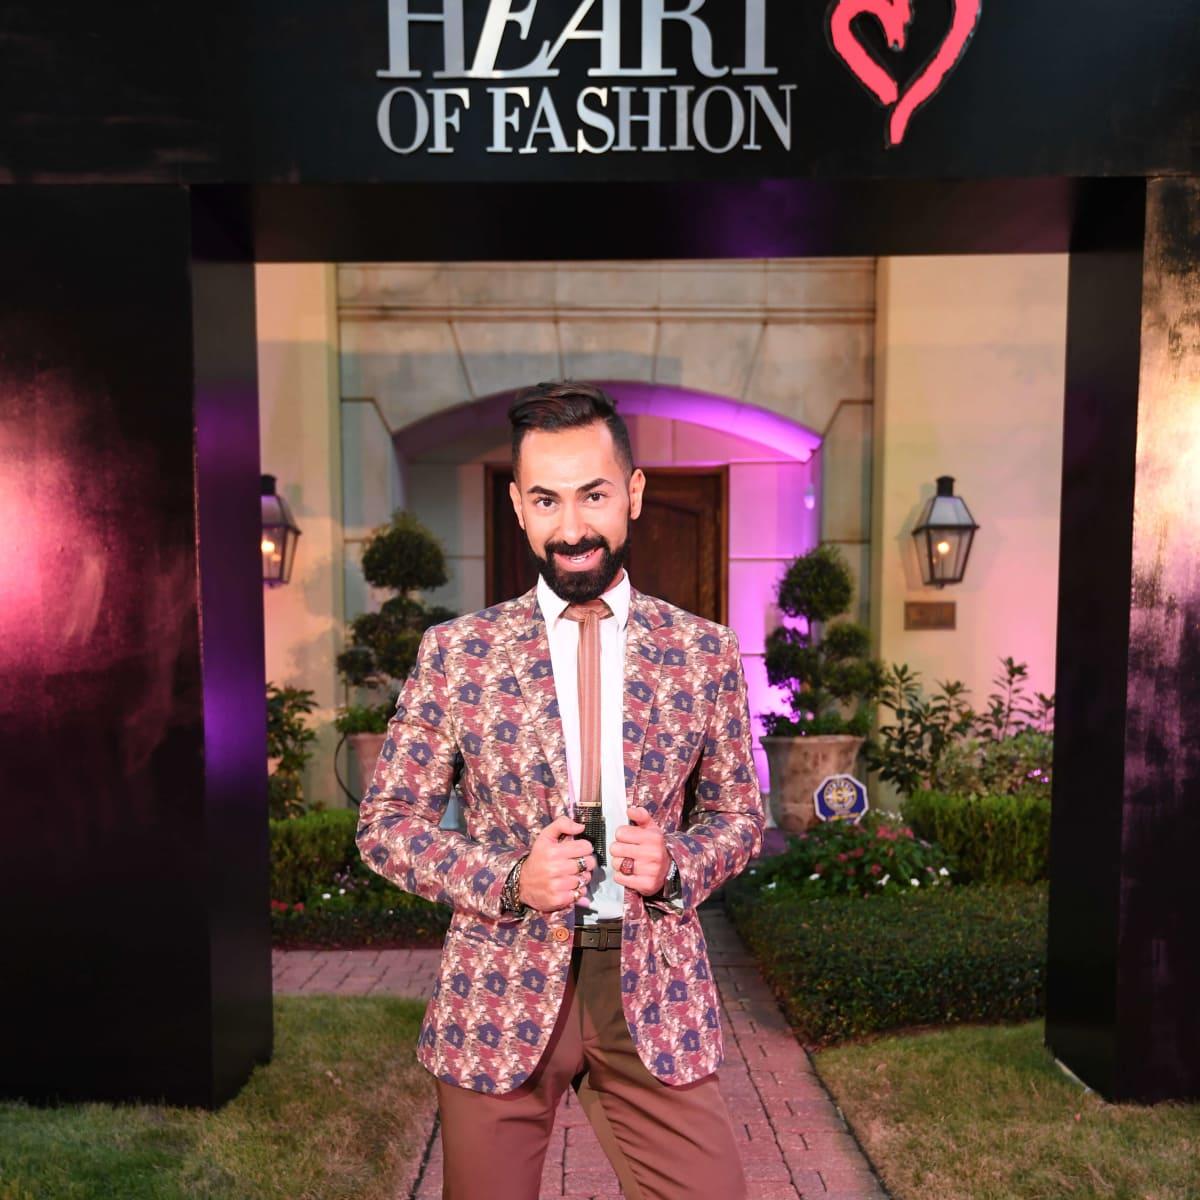 Heart of Fashion Fady Armanious